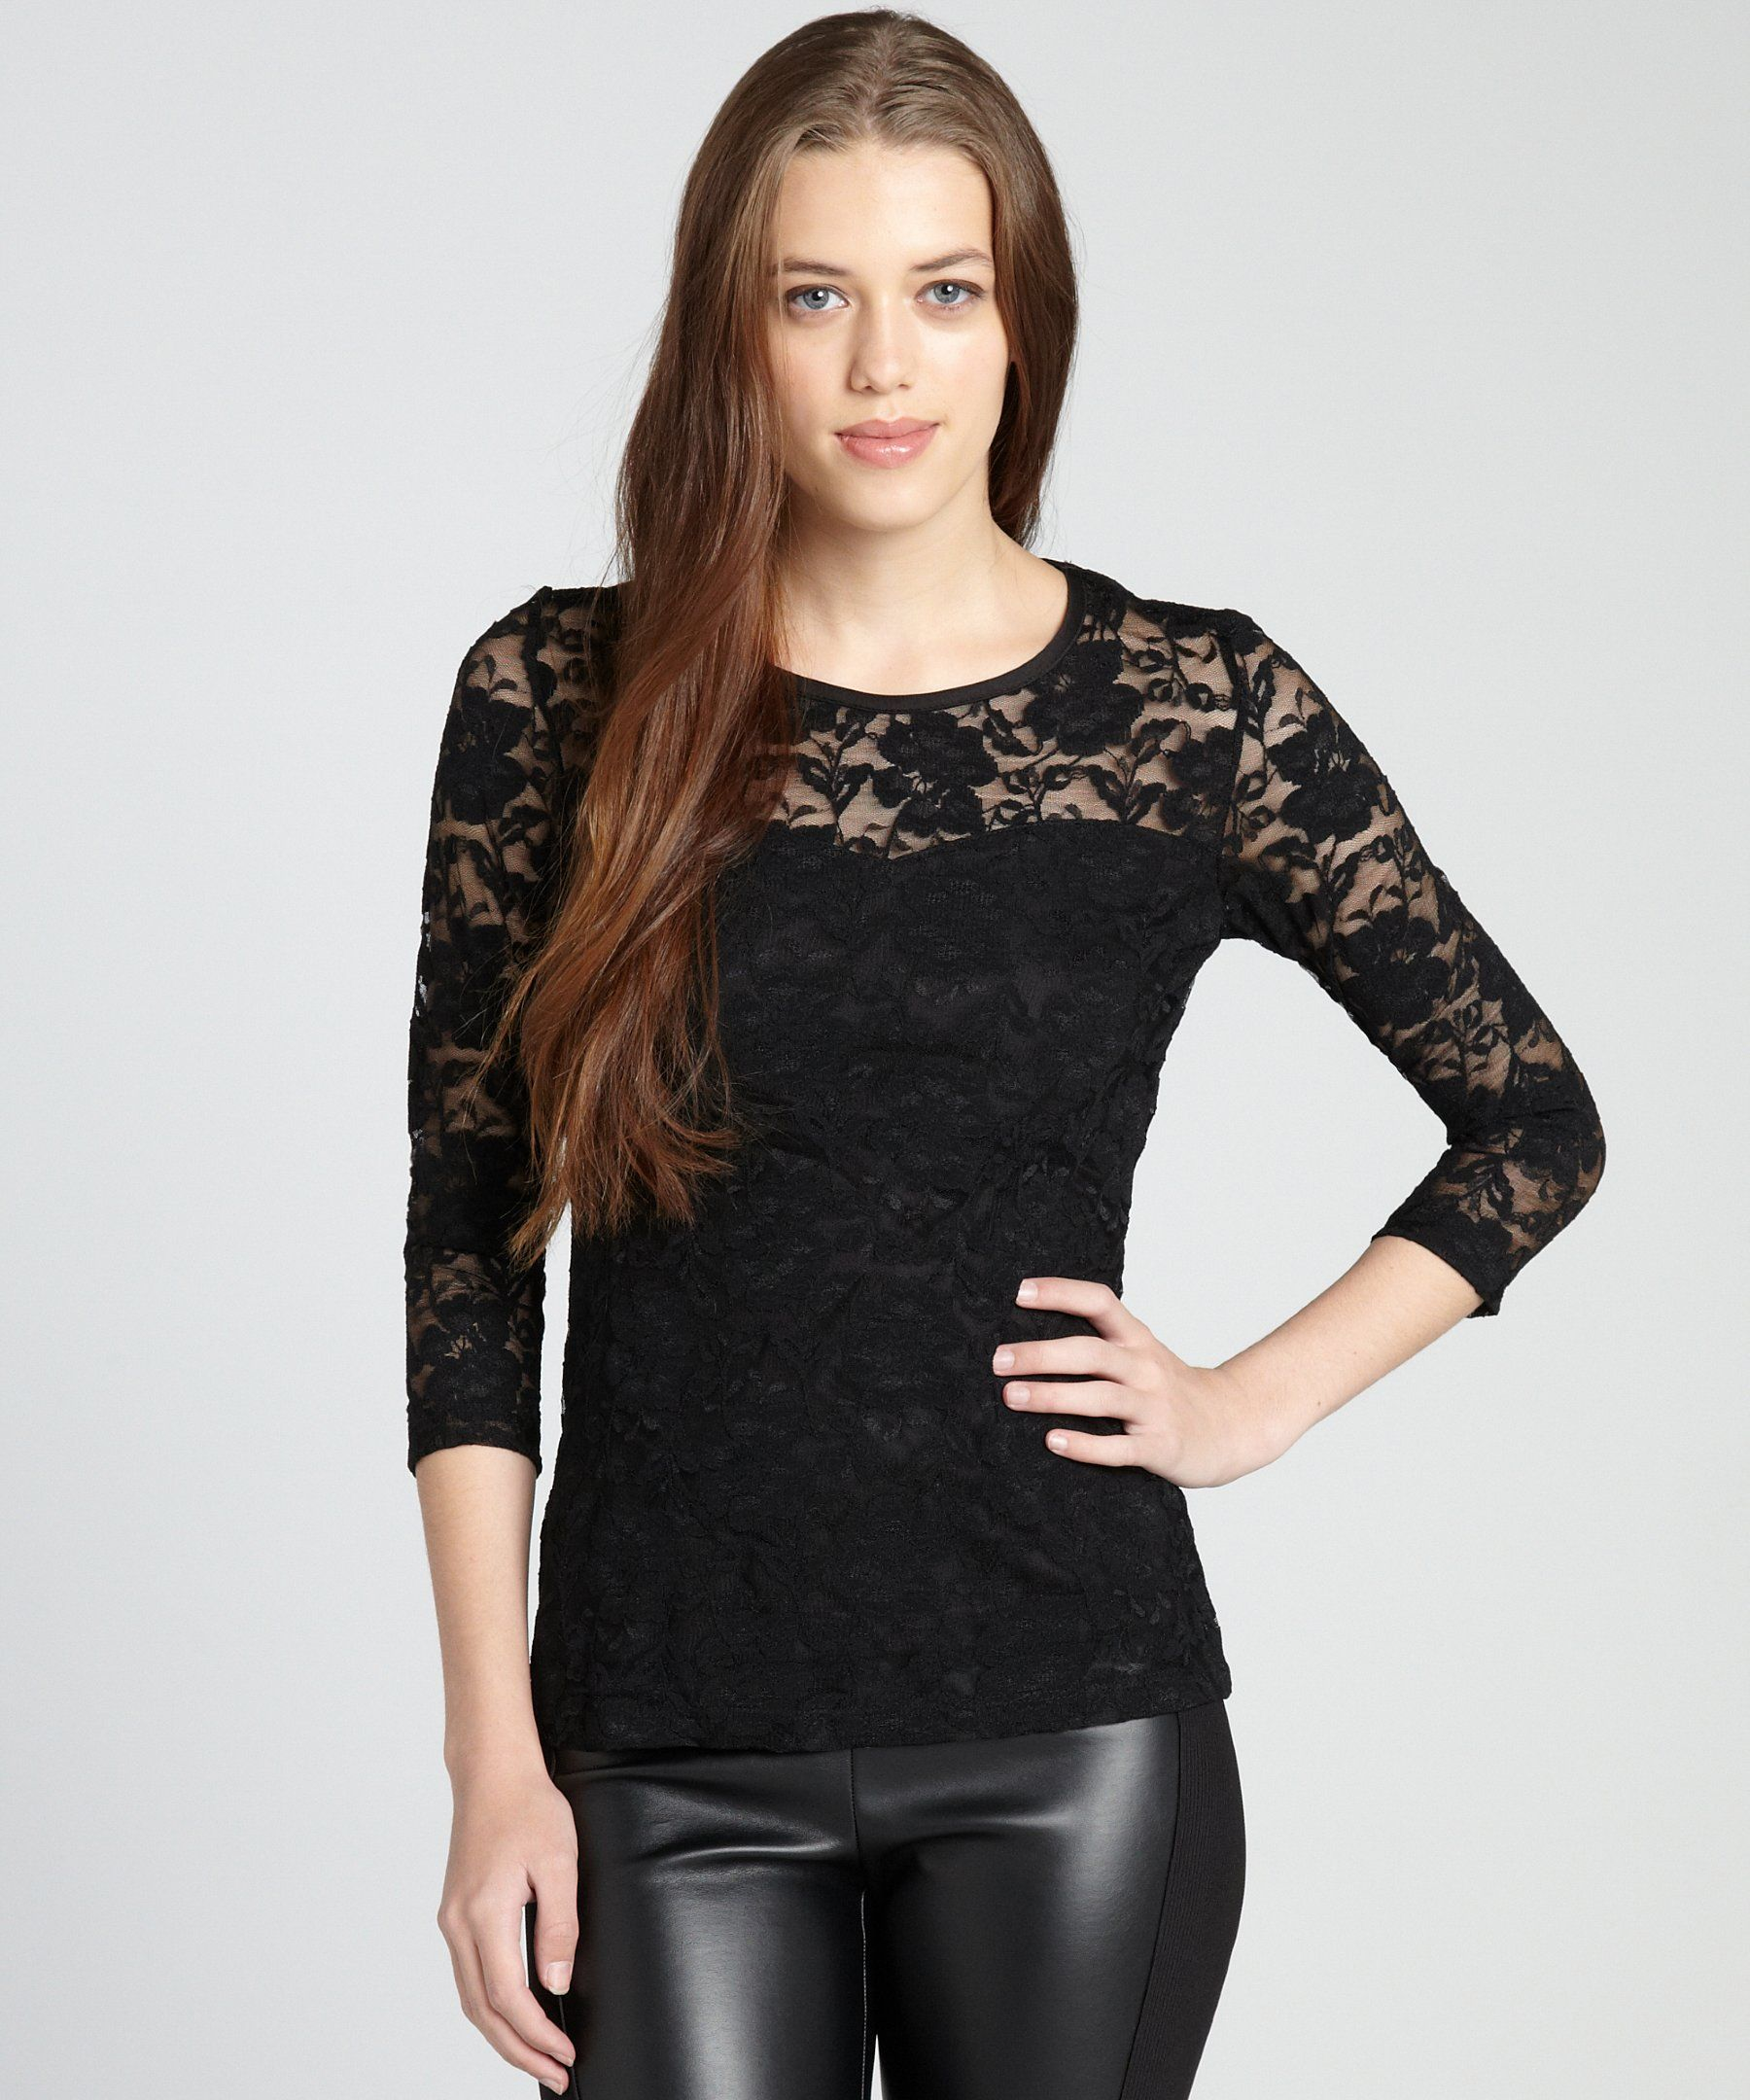 b421ee0597d Annalee + Hope black lace sheer yoke sweetheart bodice long sleeve top